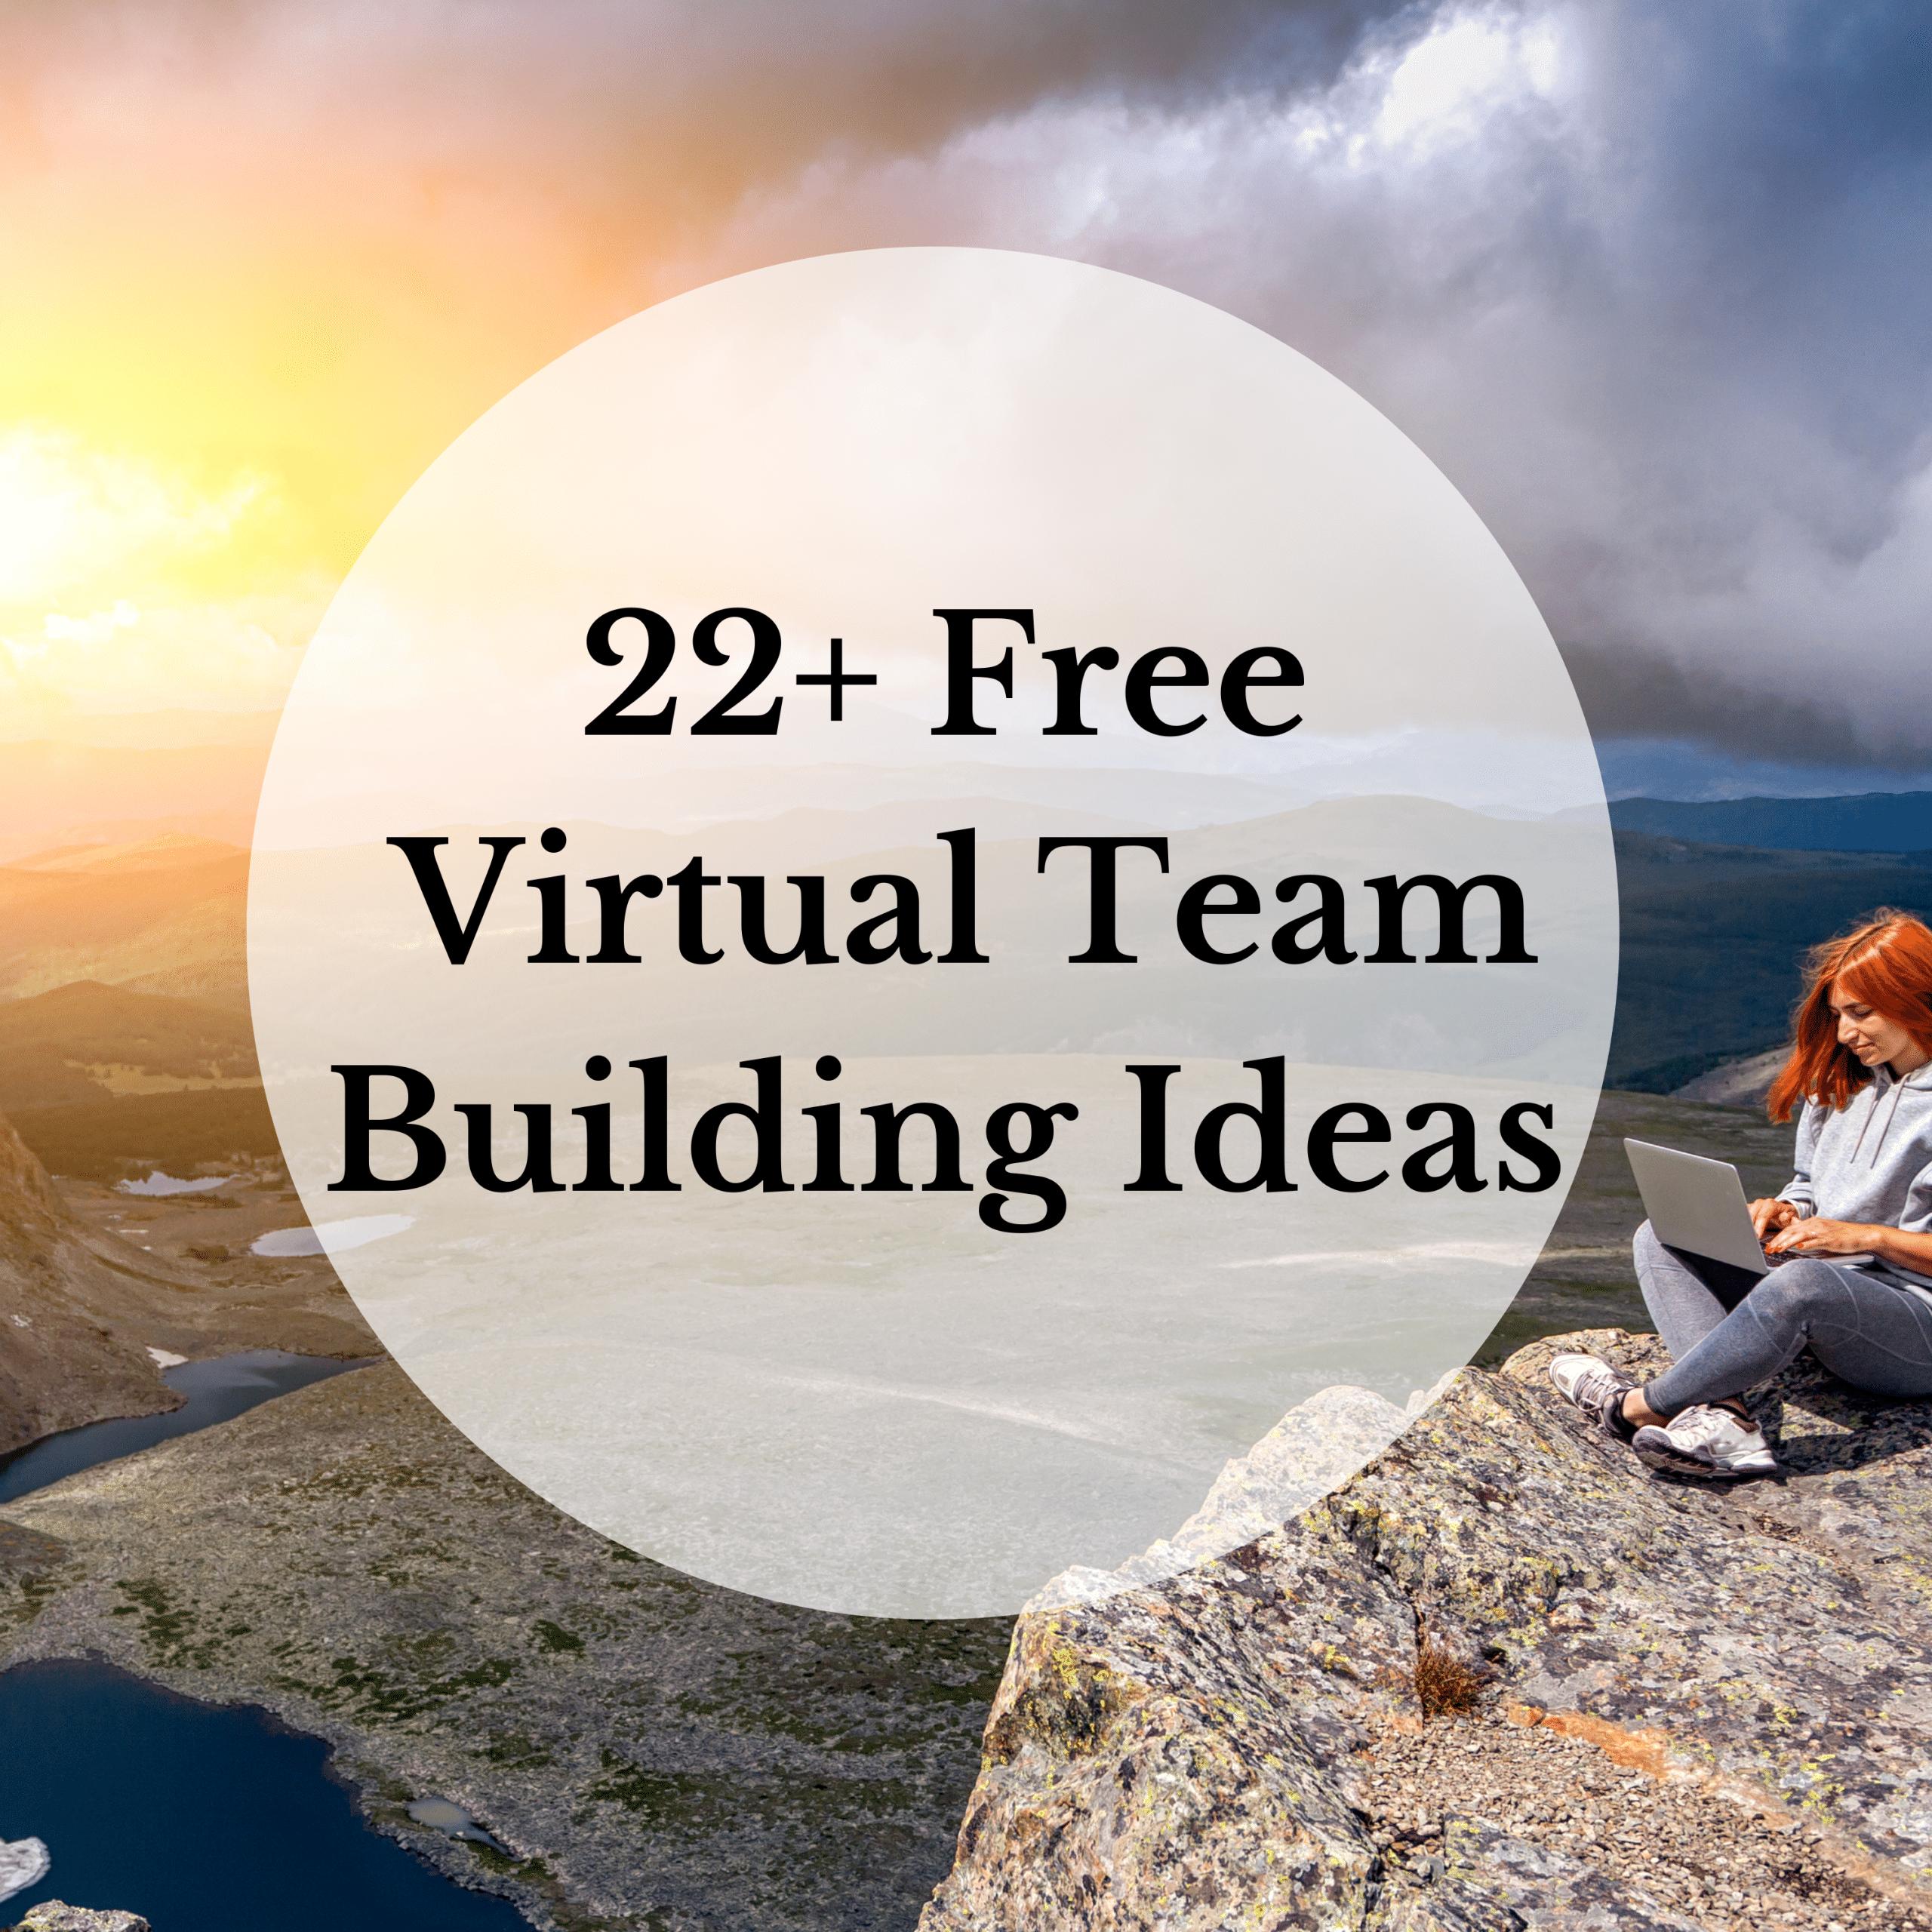 Free Virtual Team Building Ideas